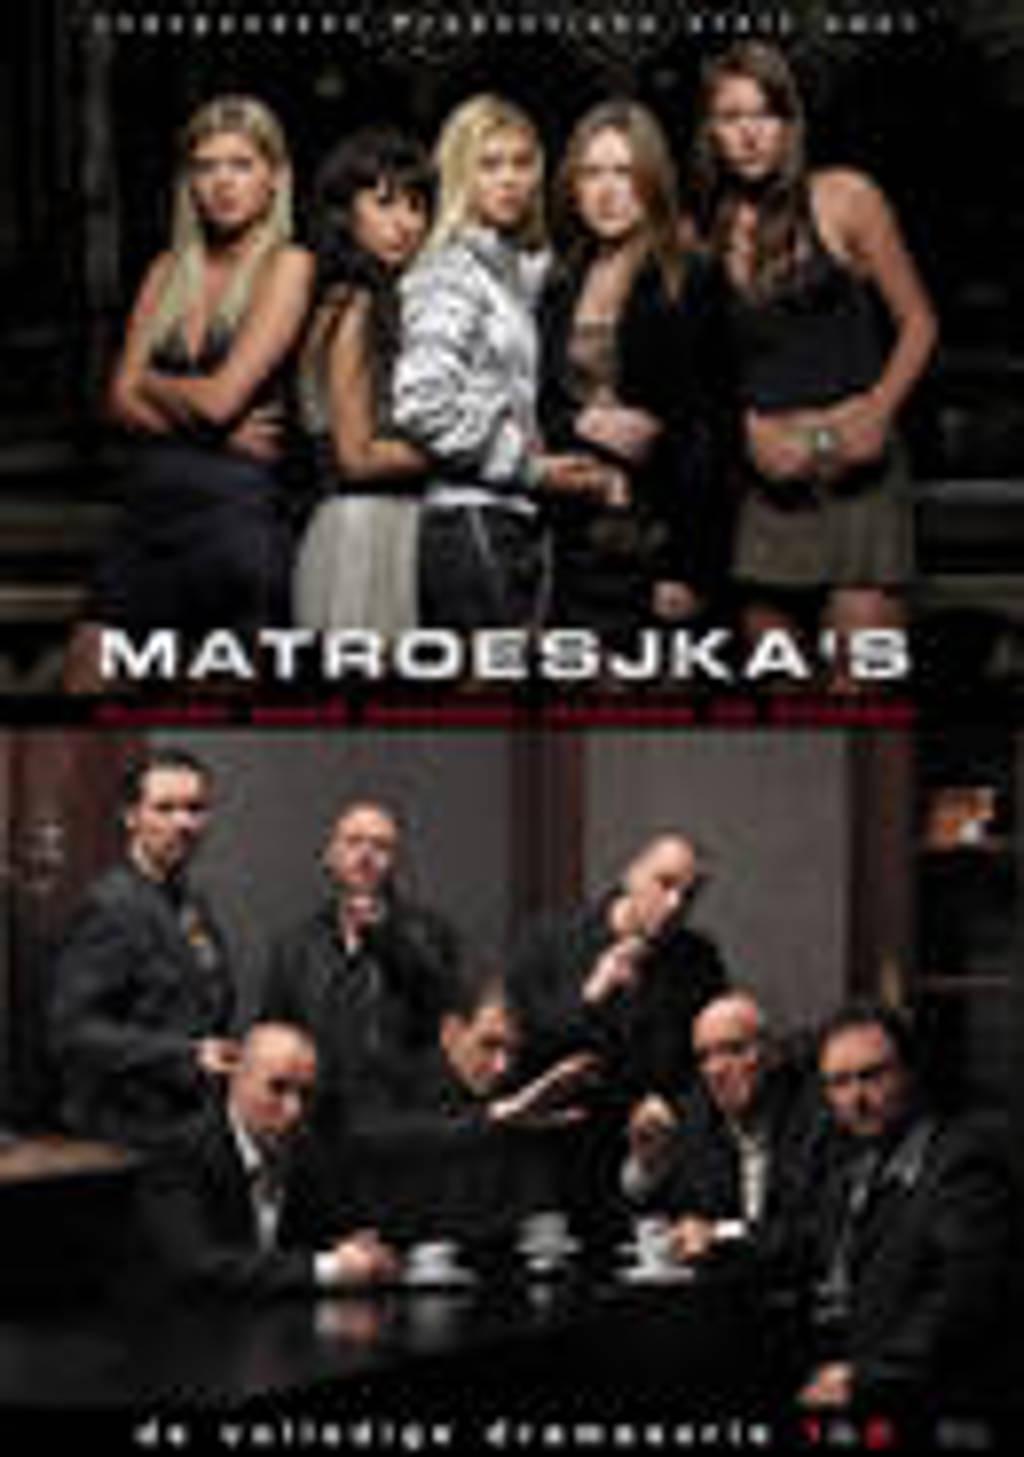 Matroesjkas - Seizoen 1 & 2 (DVD)